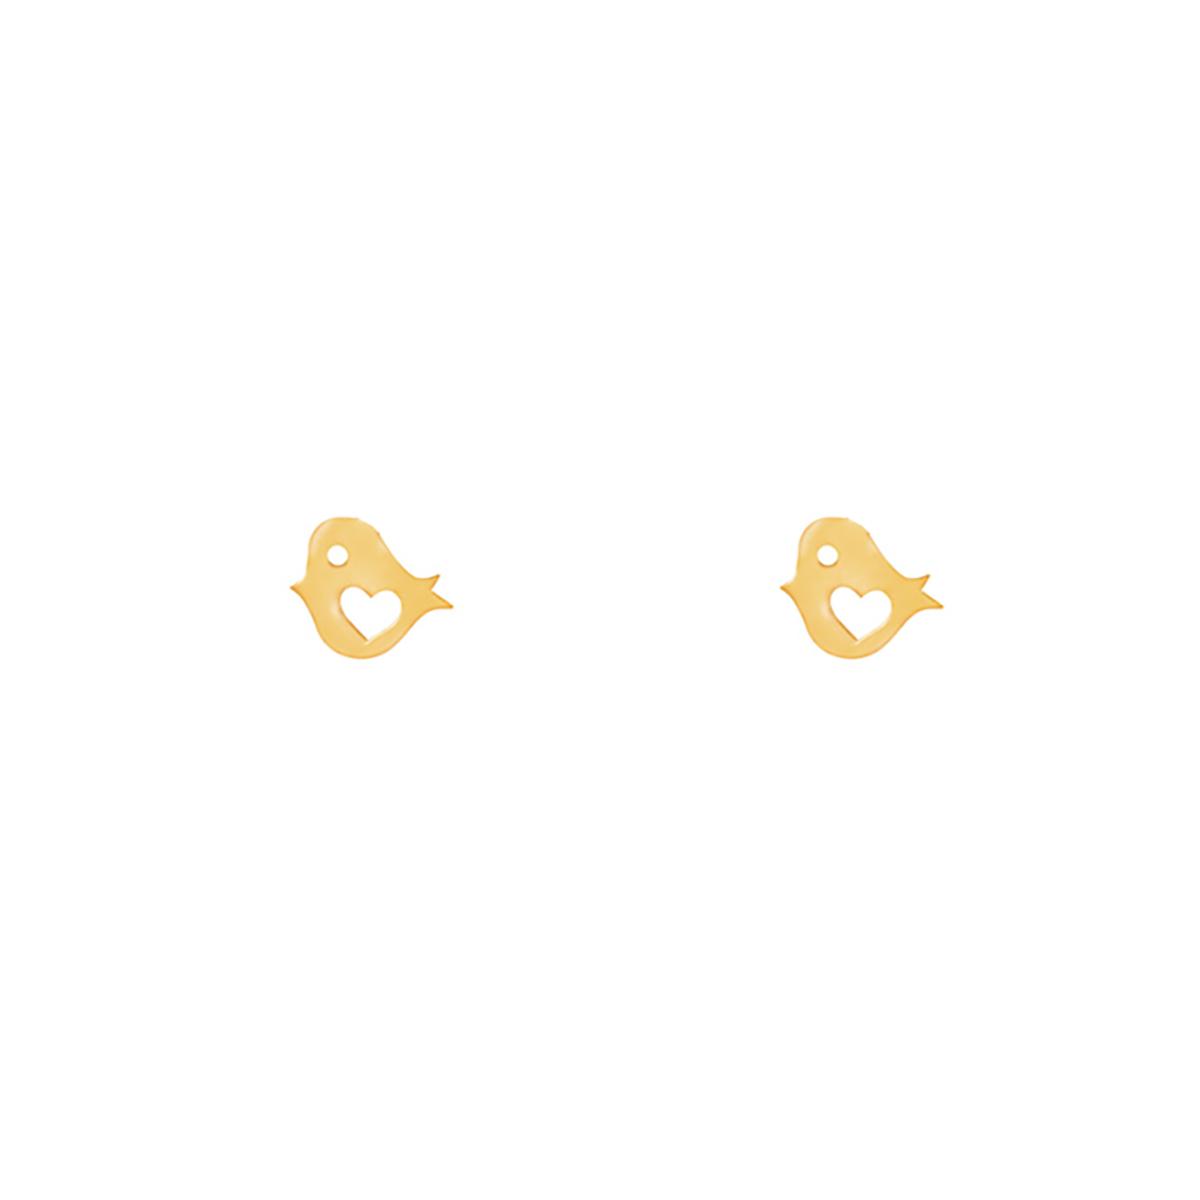 گوشواره طلا گنجشک و قلب